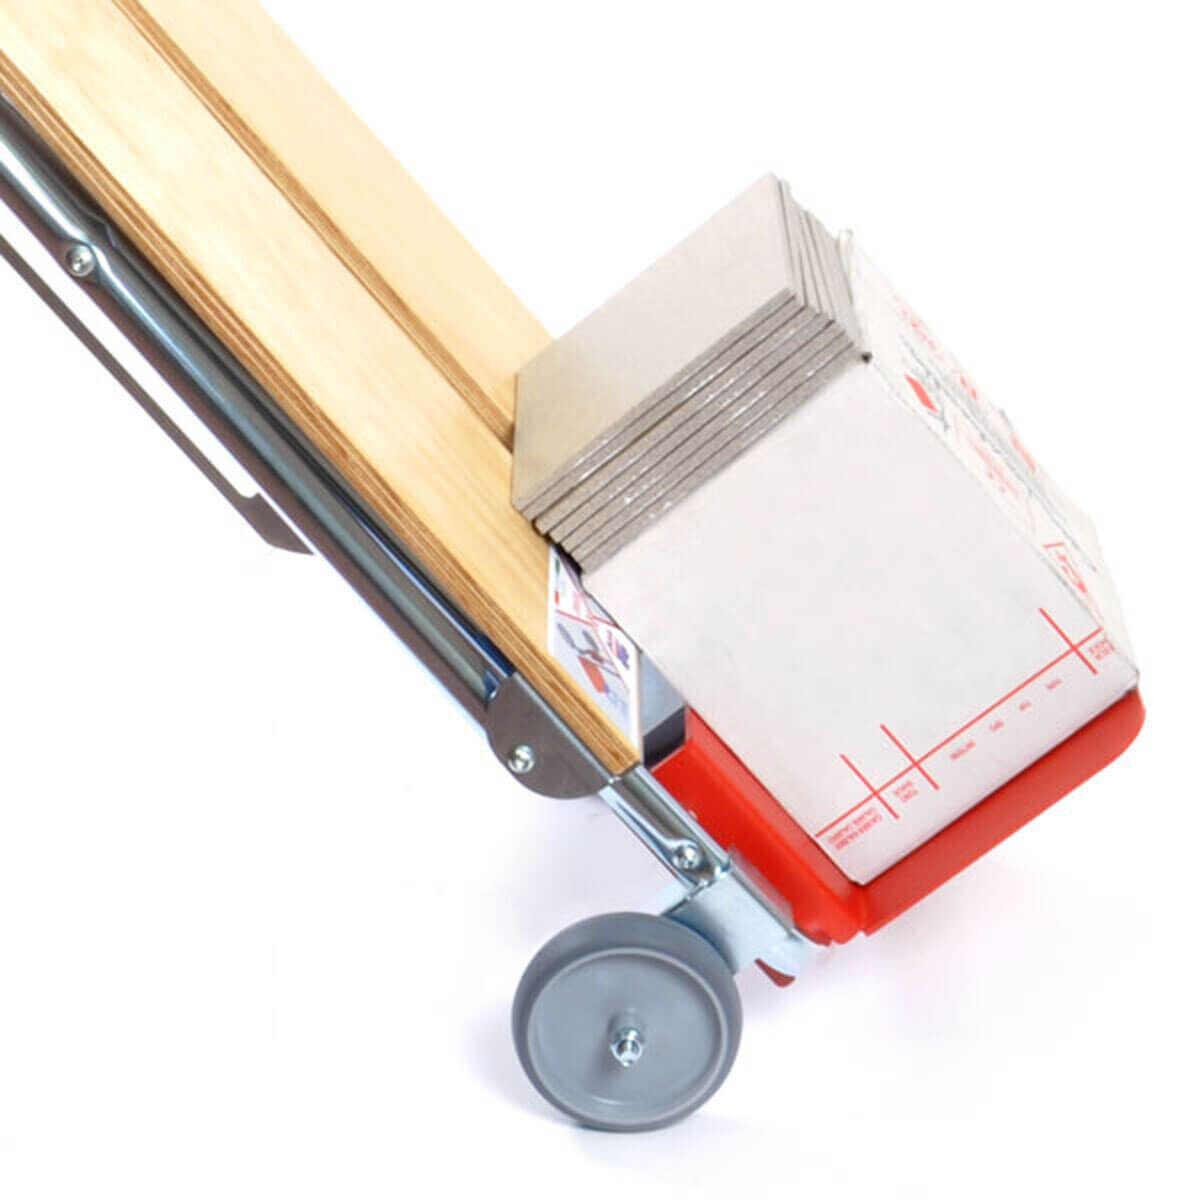 x-works portable tile cart